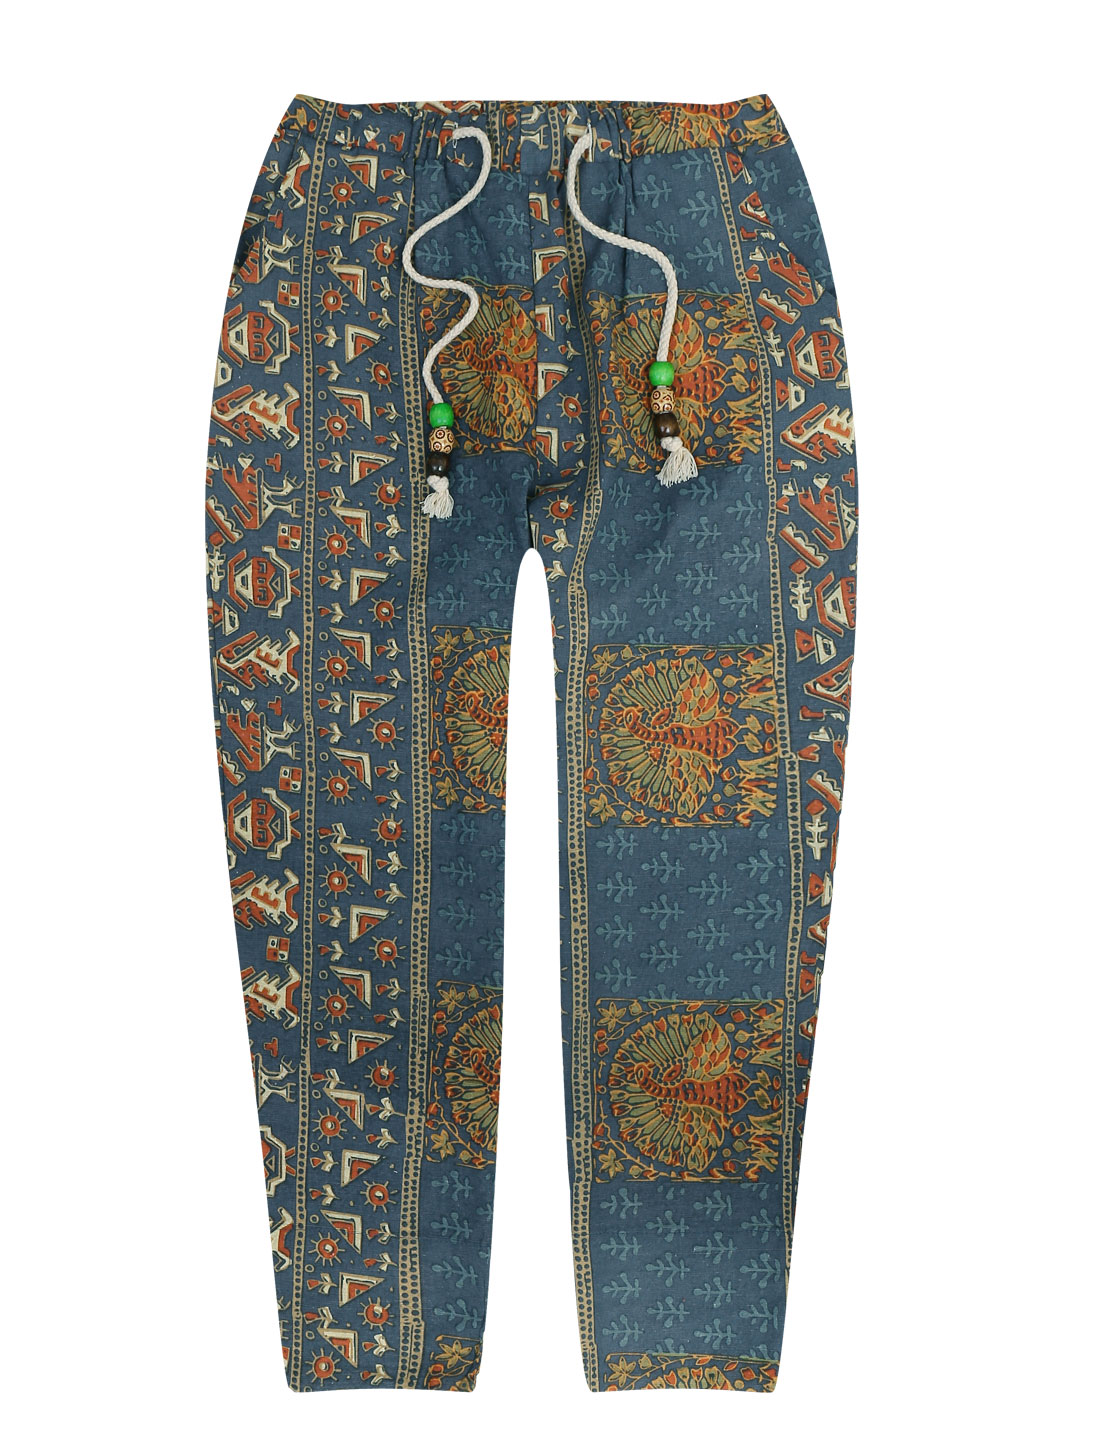 Men Stylish Elastic Drawstring Waist Novelty Prints Cropped Pants Multicolor W30